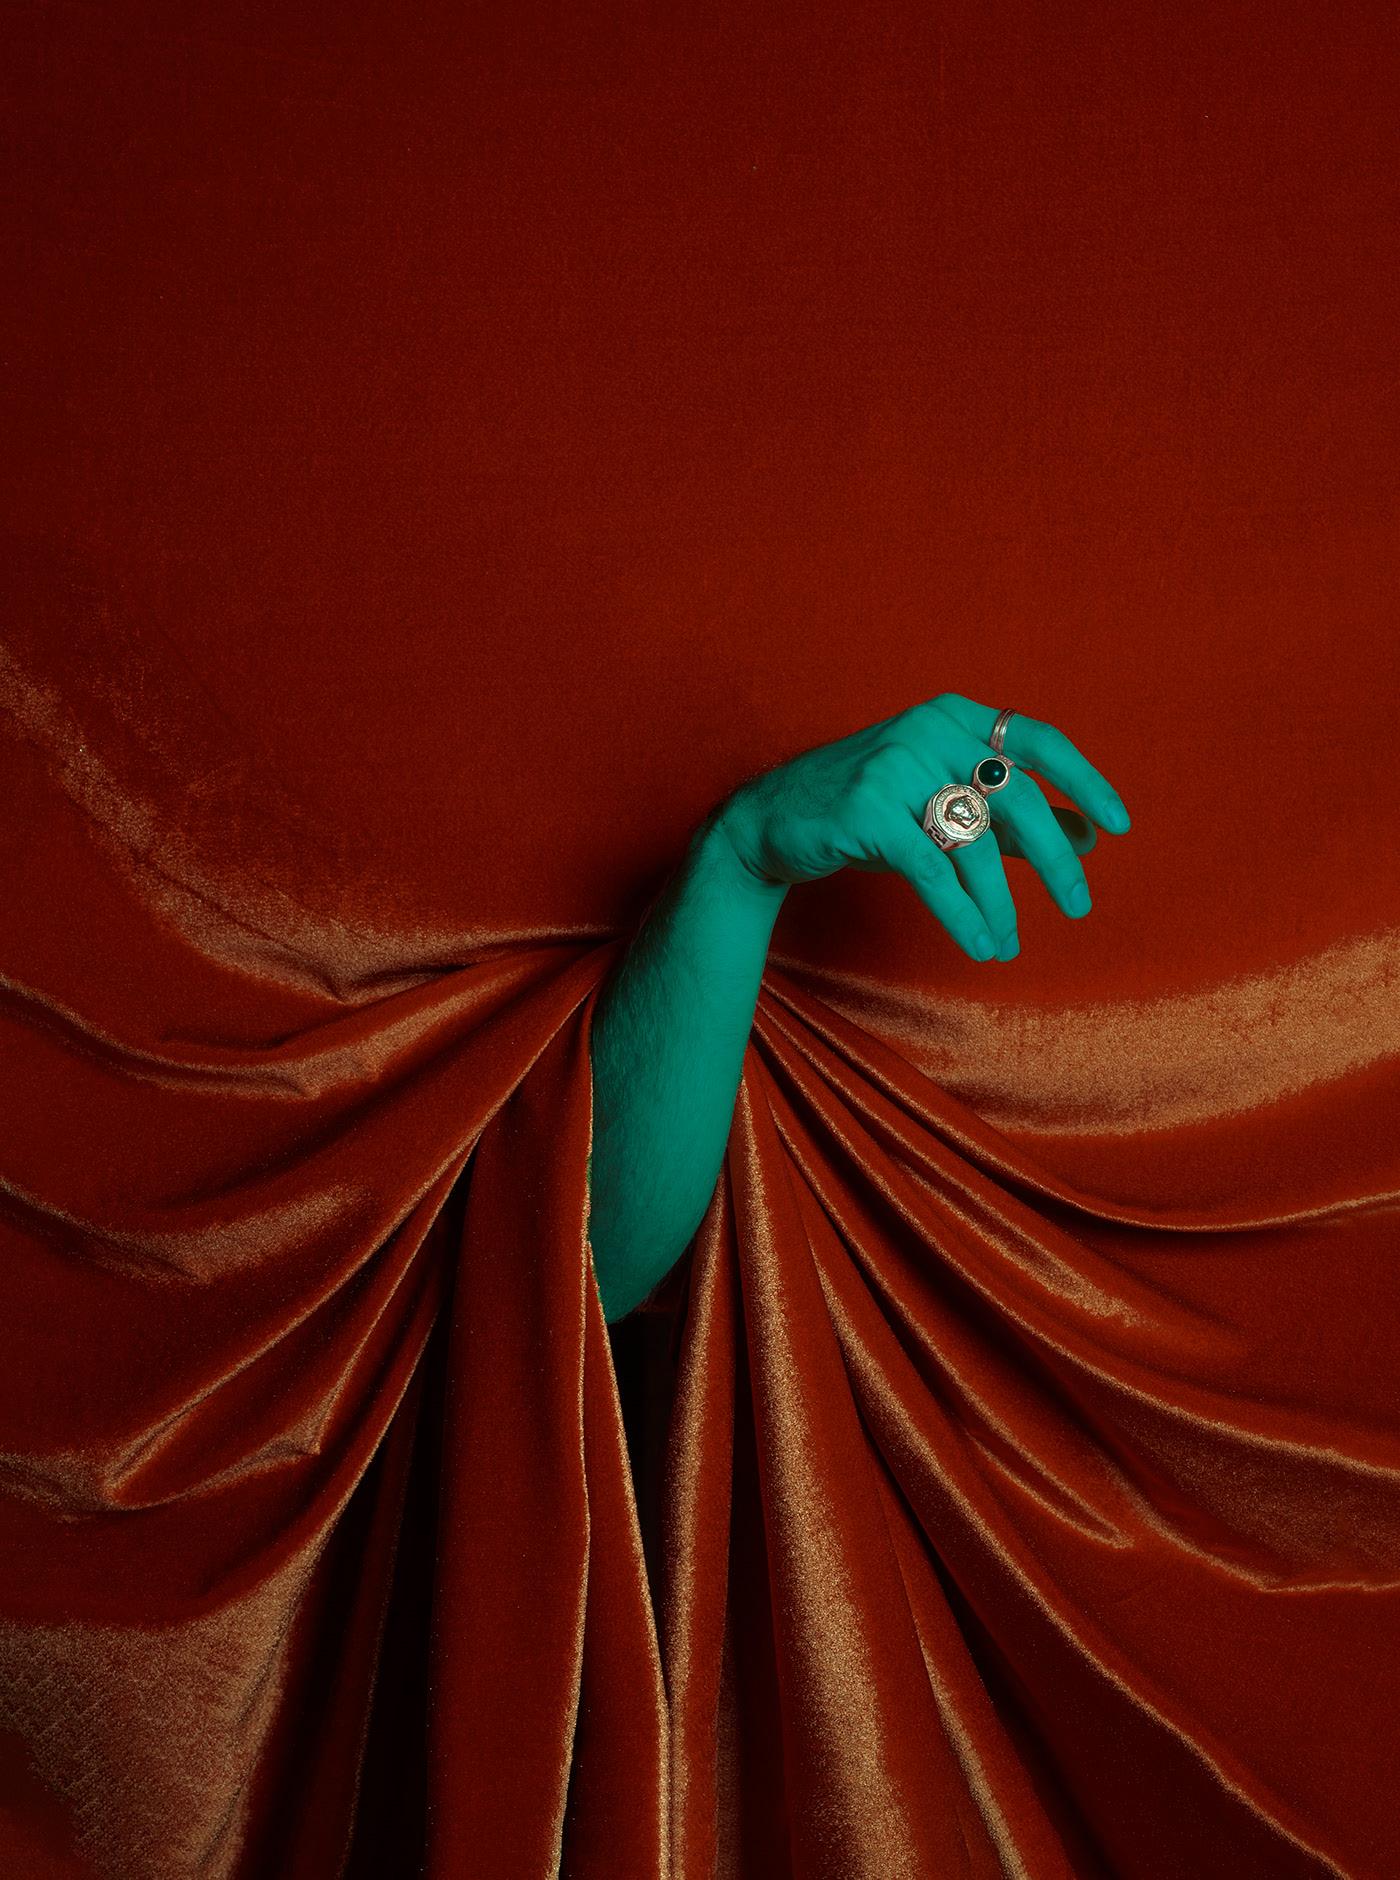 ROUGE / фотограф Paolo Barretta